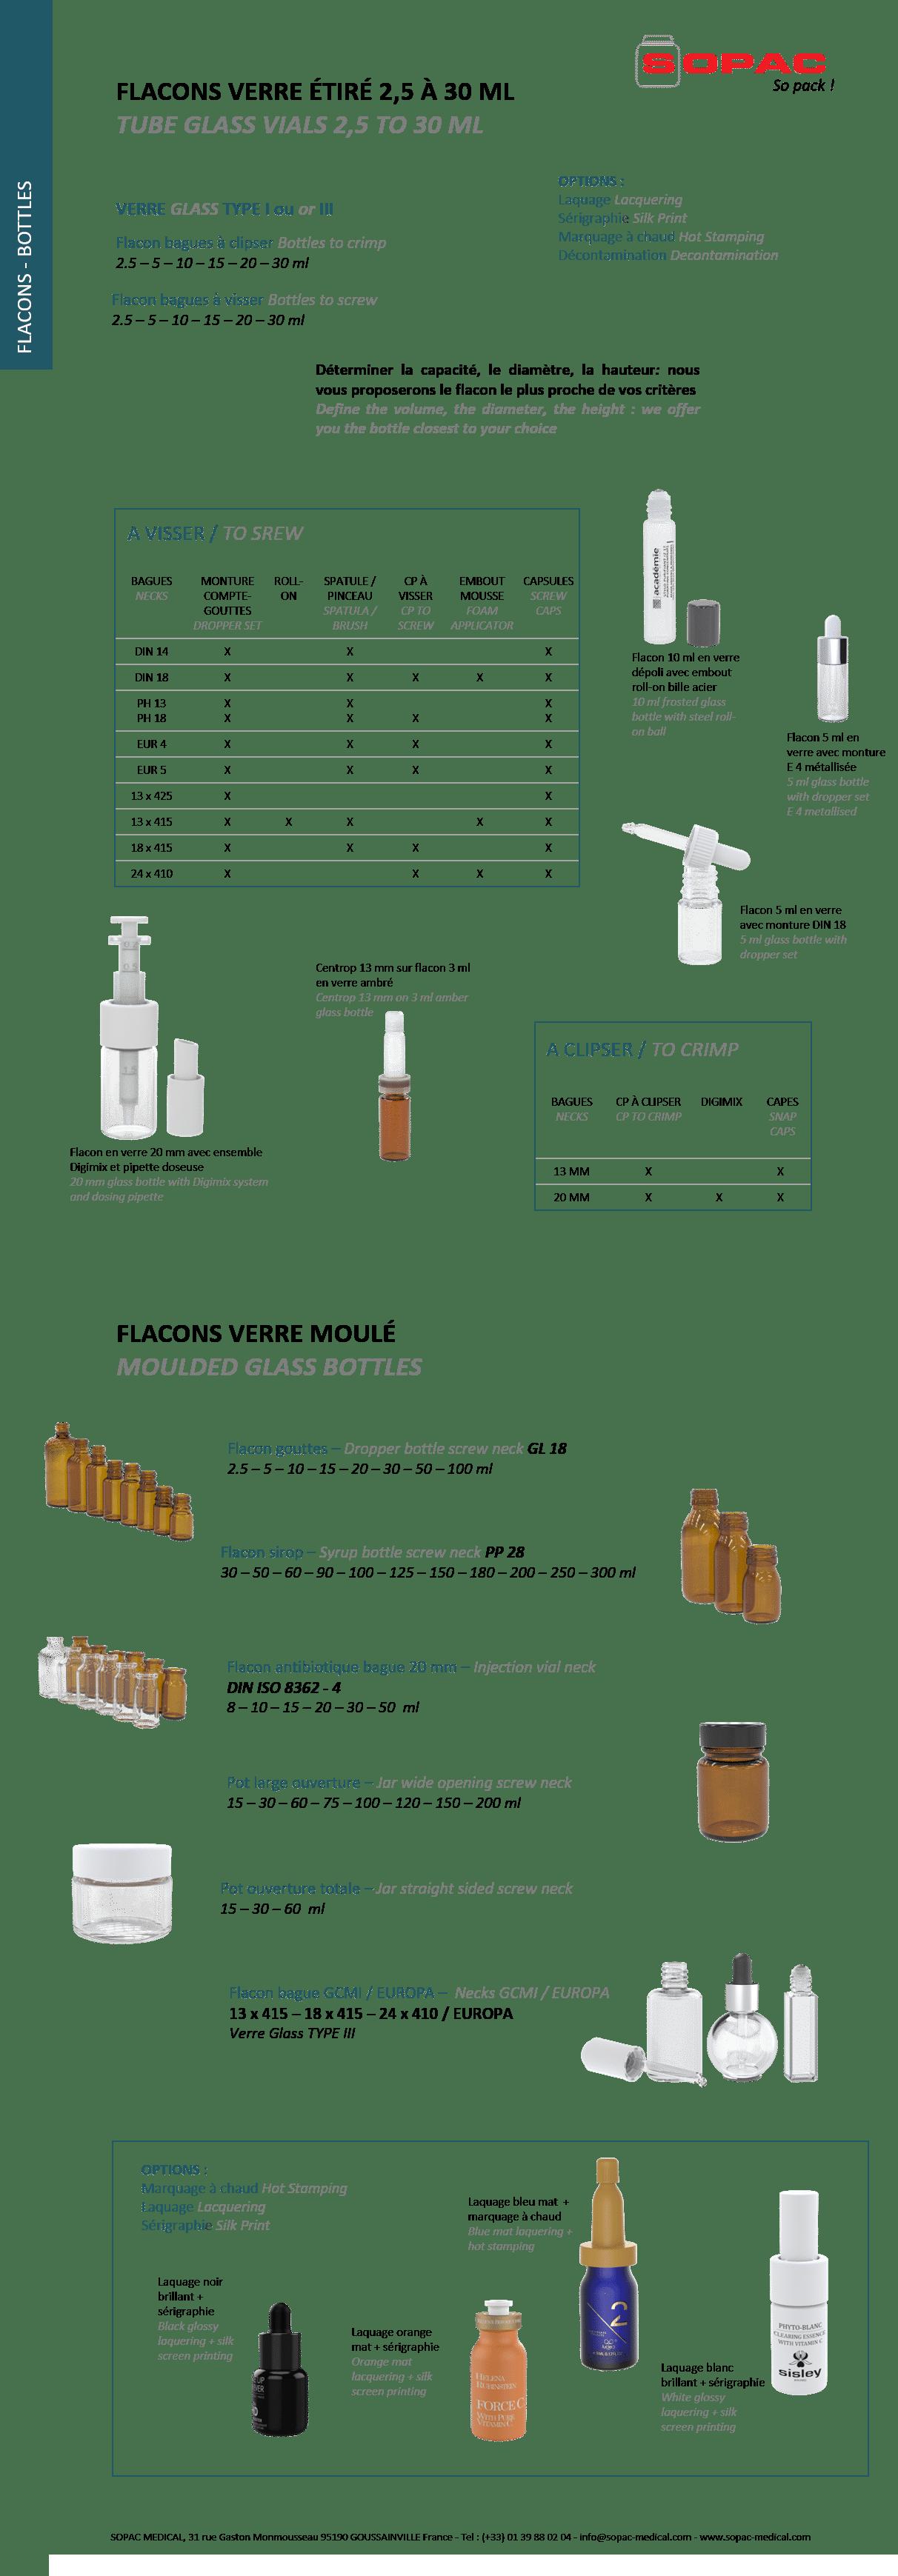 Glass bottles and vials